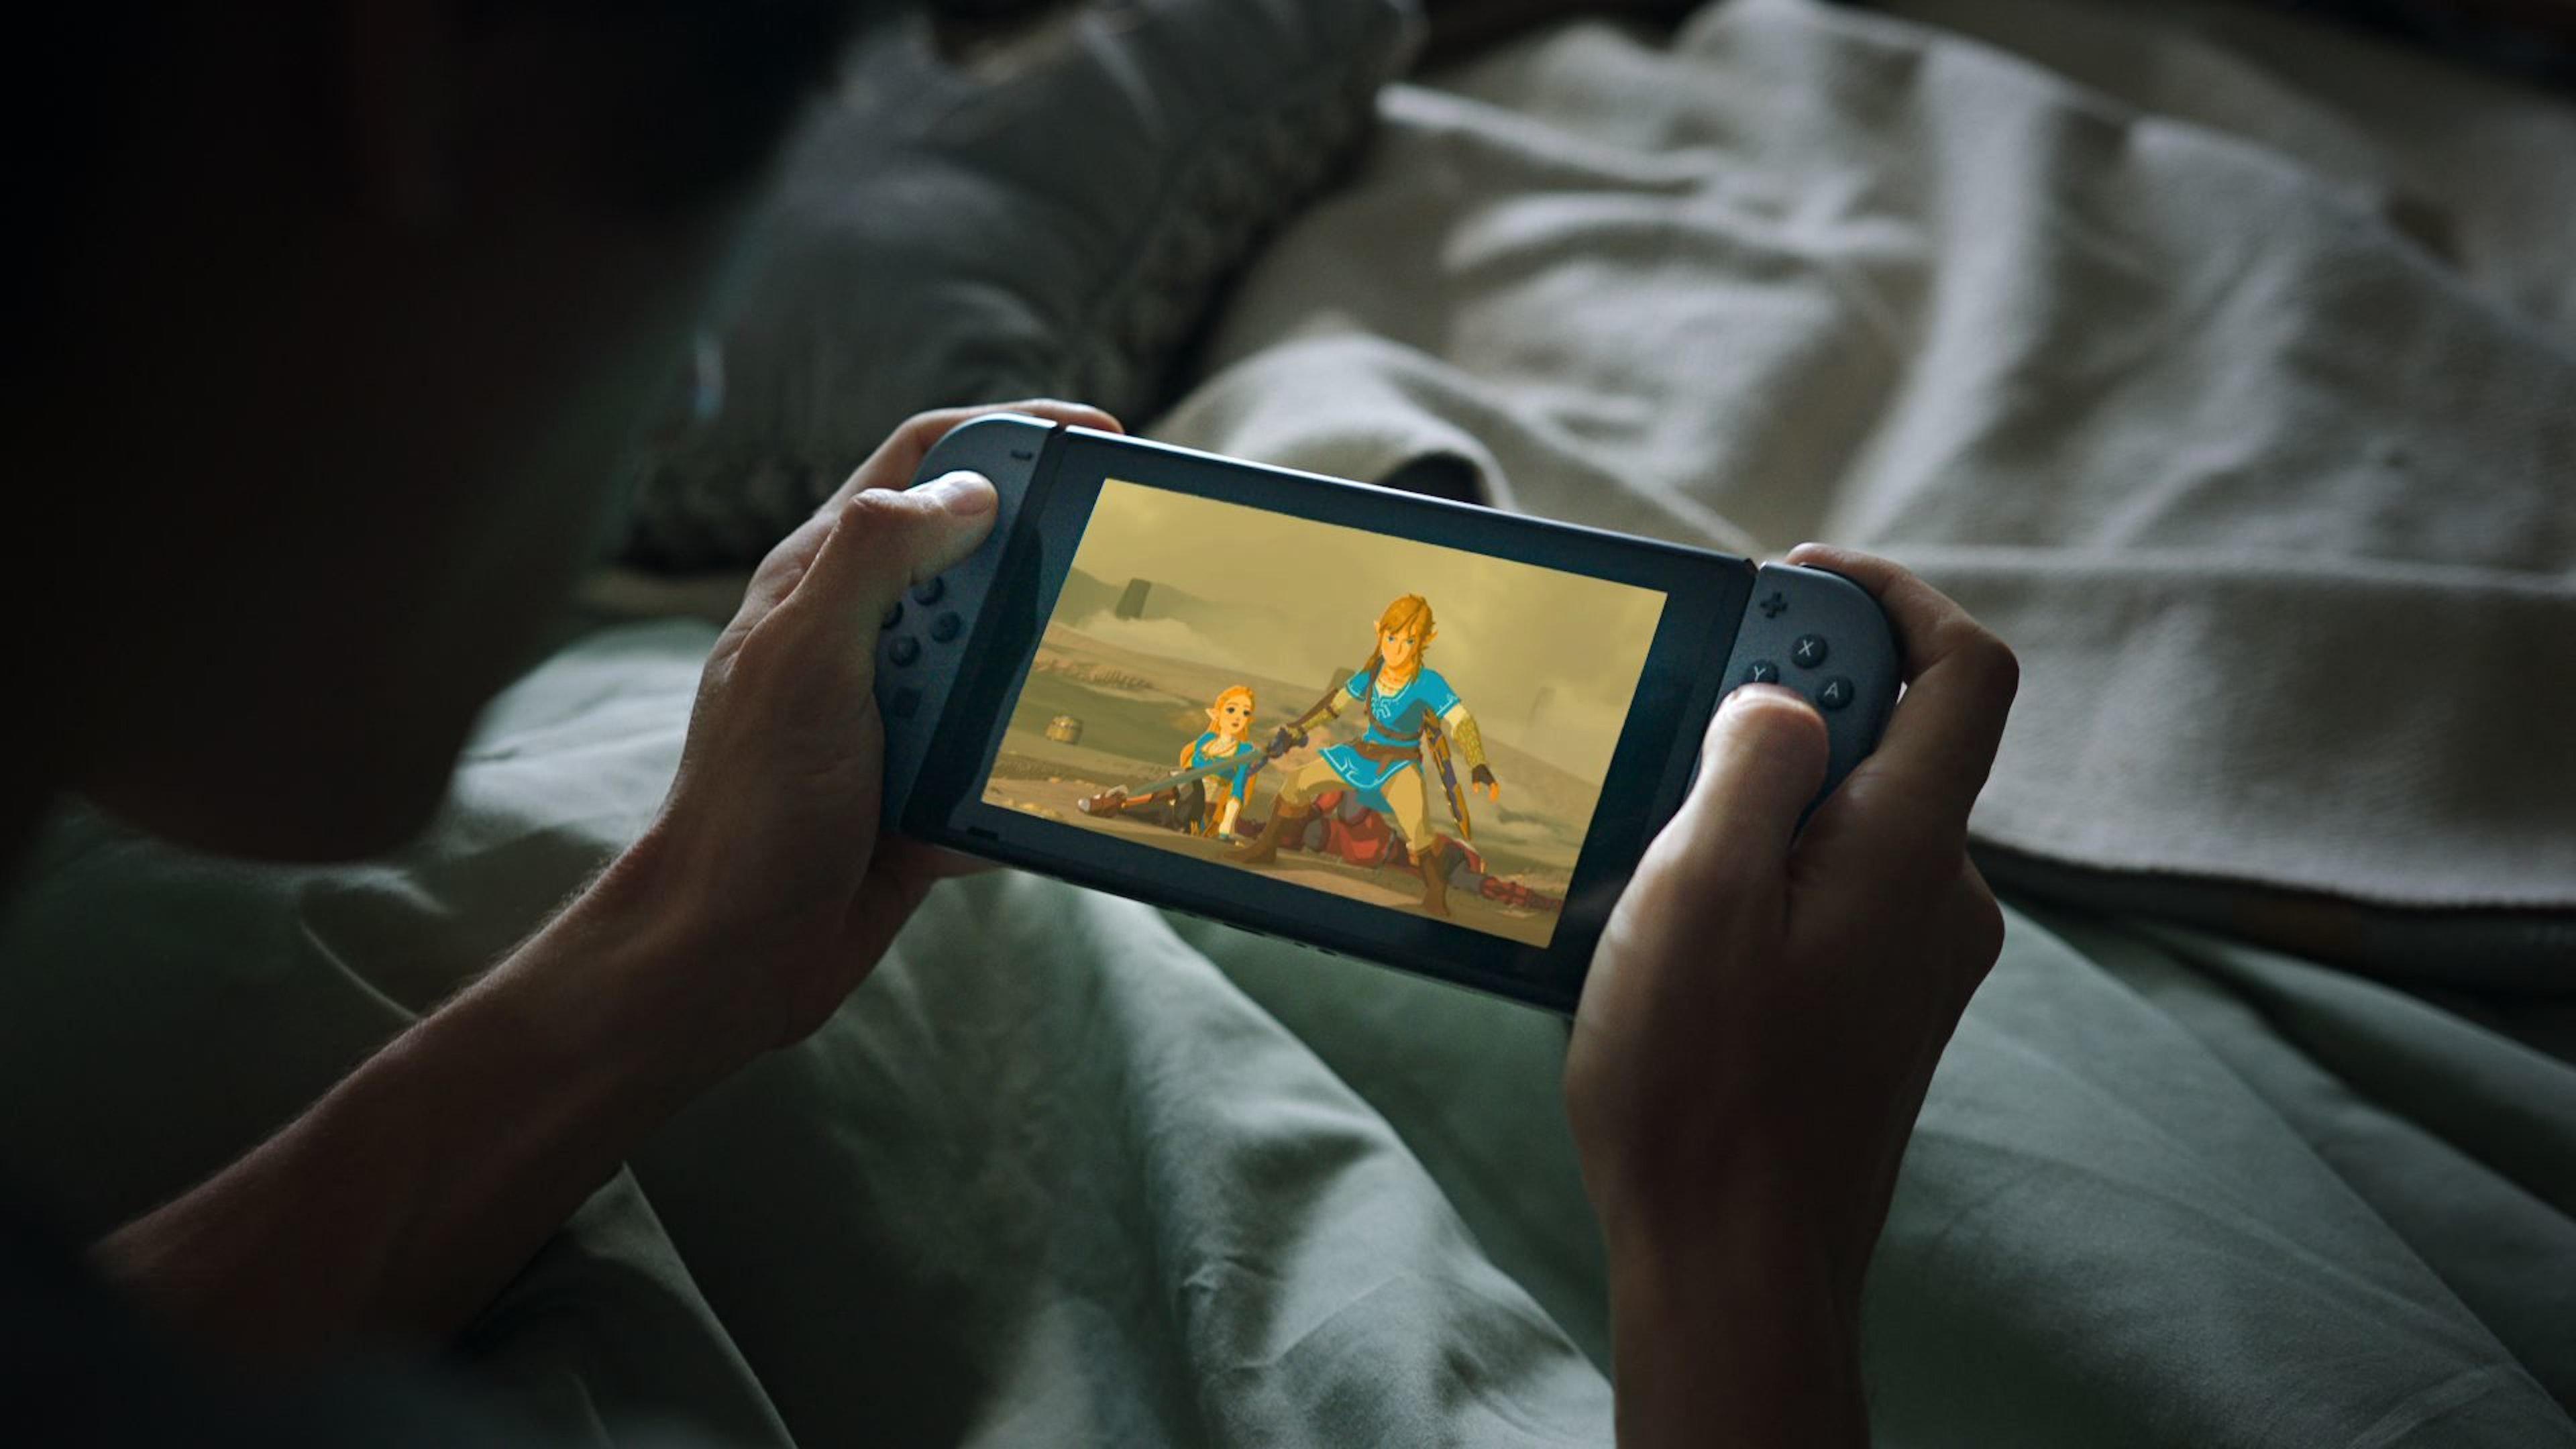 Promotion nintendo fortnite, avis nintendo switch jeux note